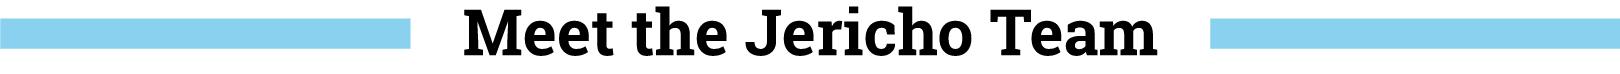 Jericho Team